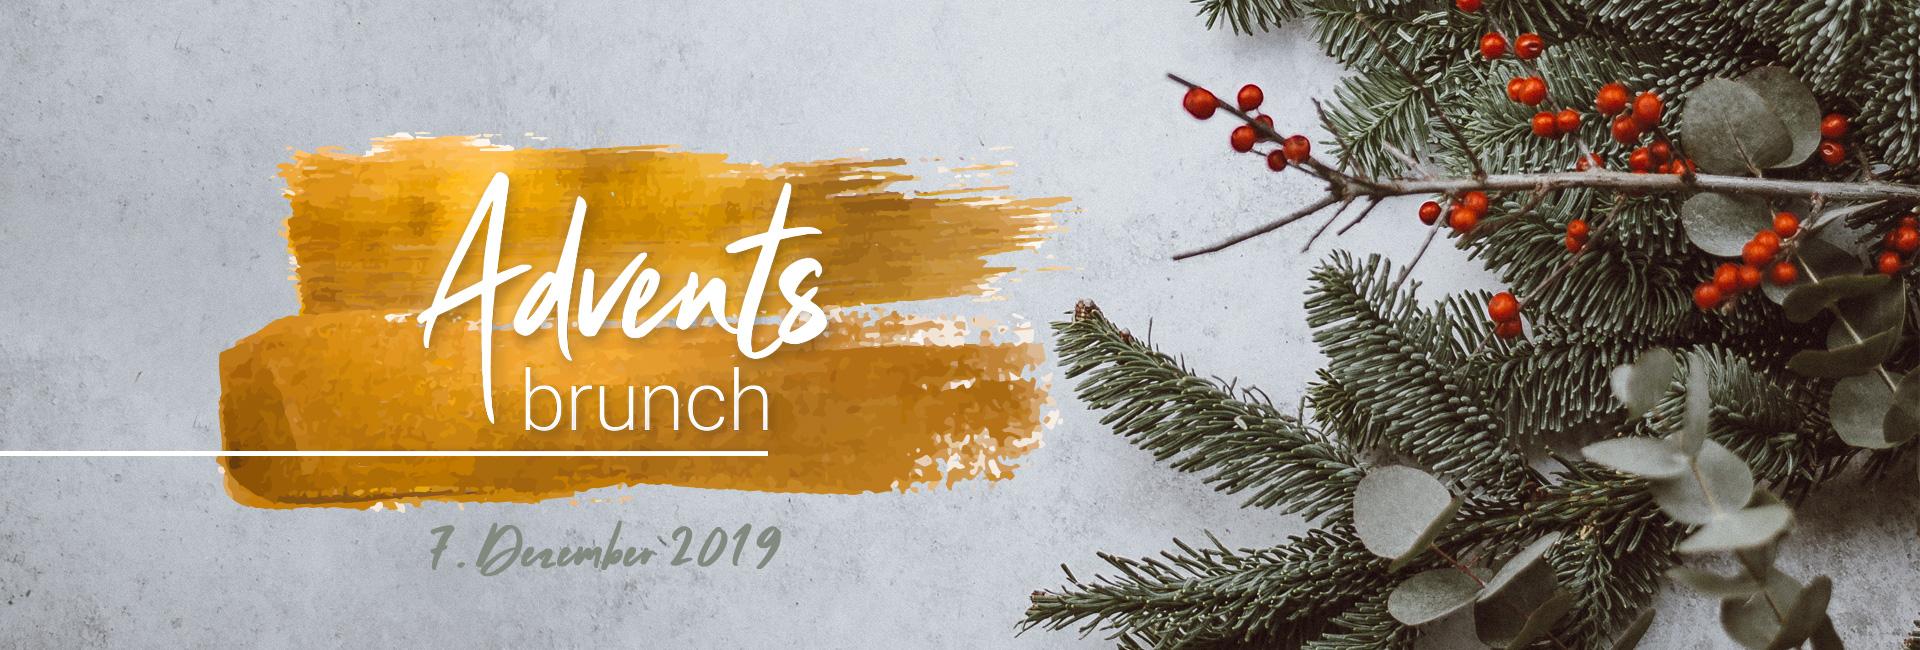 slide de SFH Adventsbrunch 2019 2